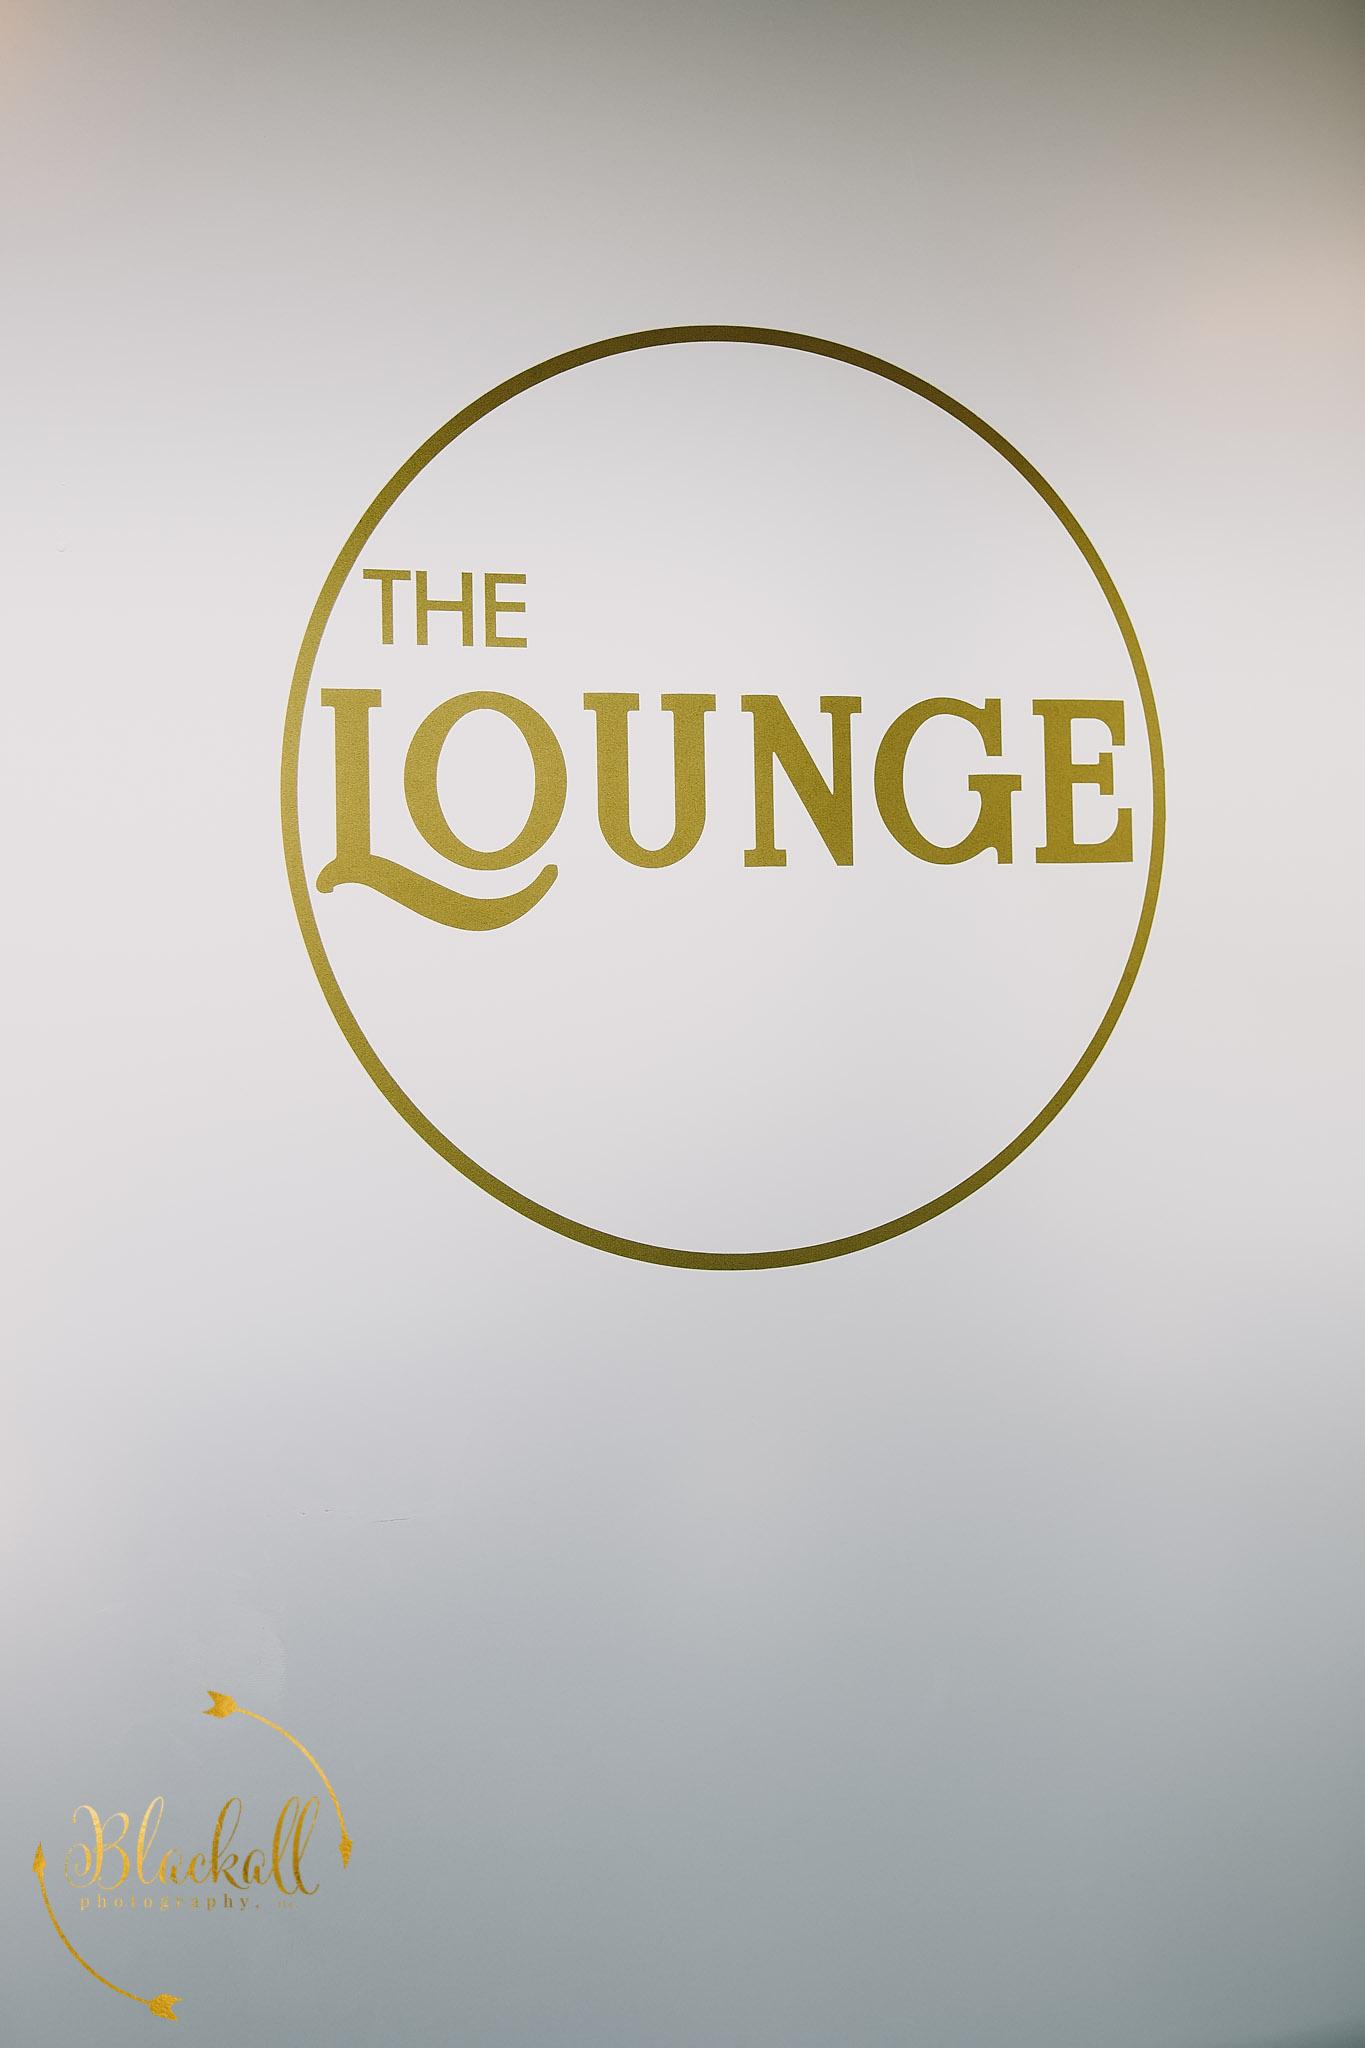 TheLounge_1.JPG